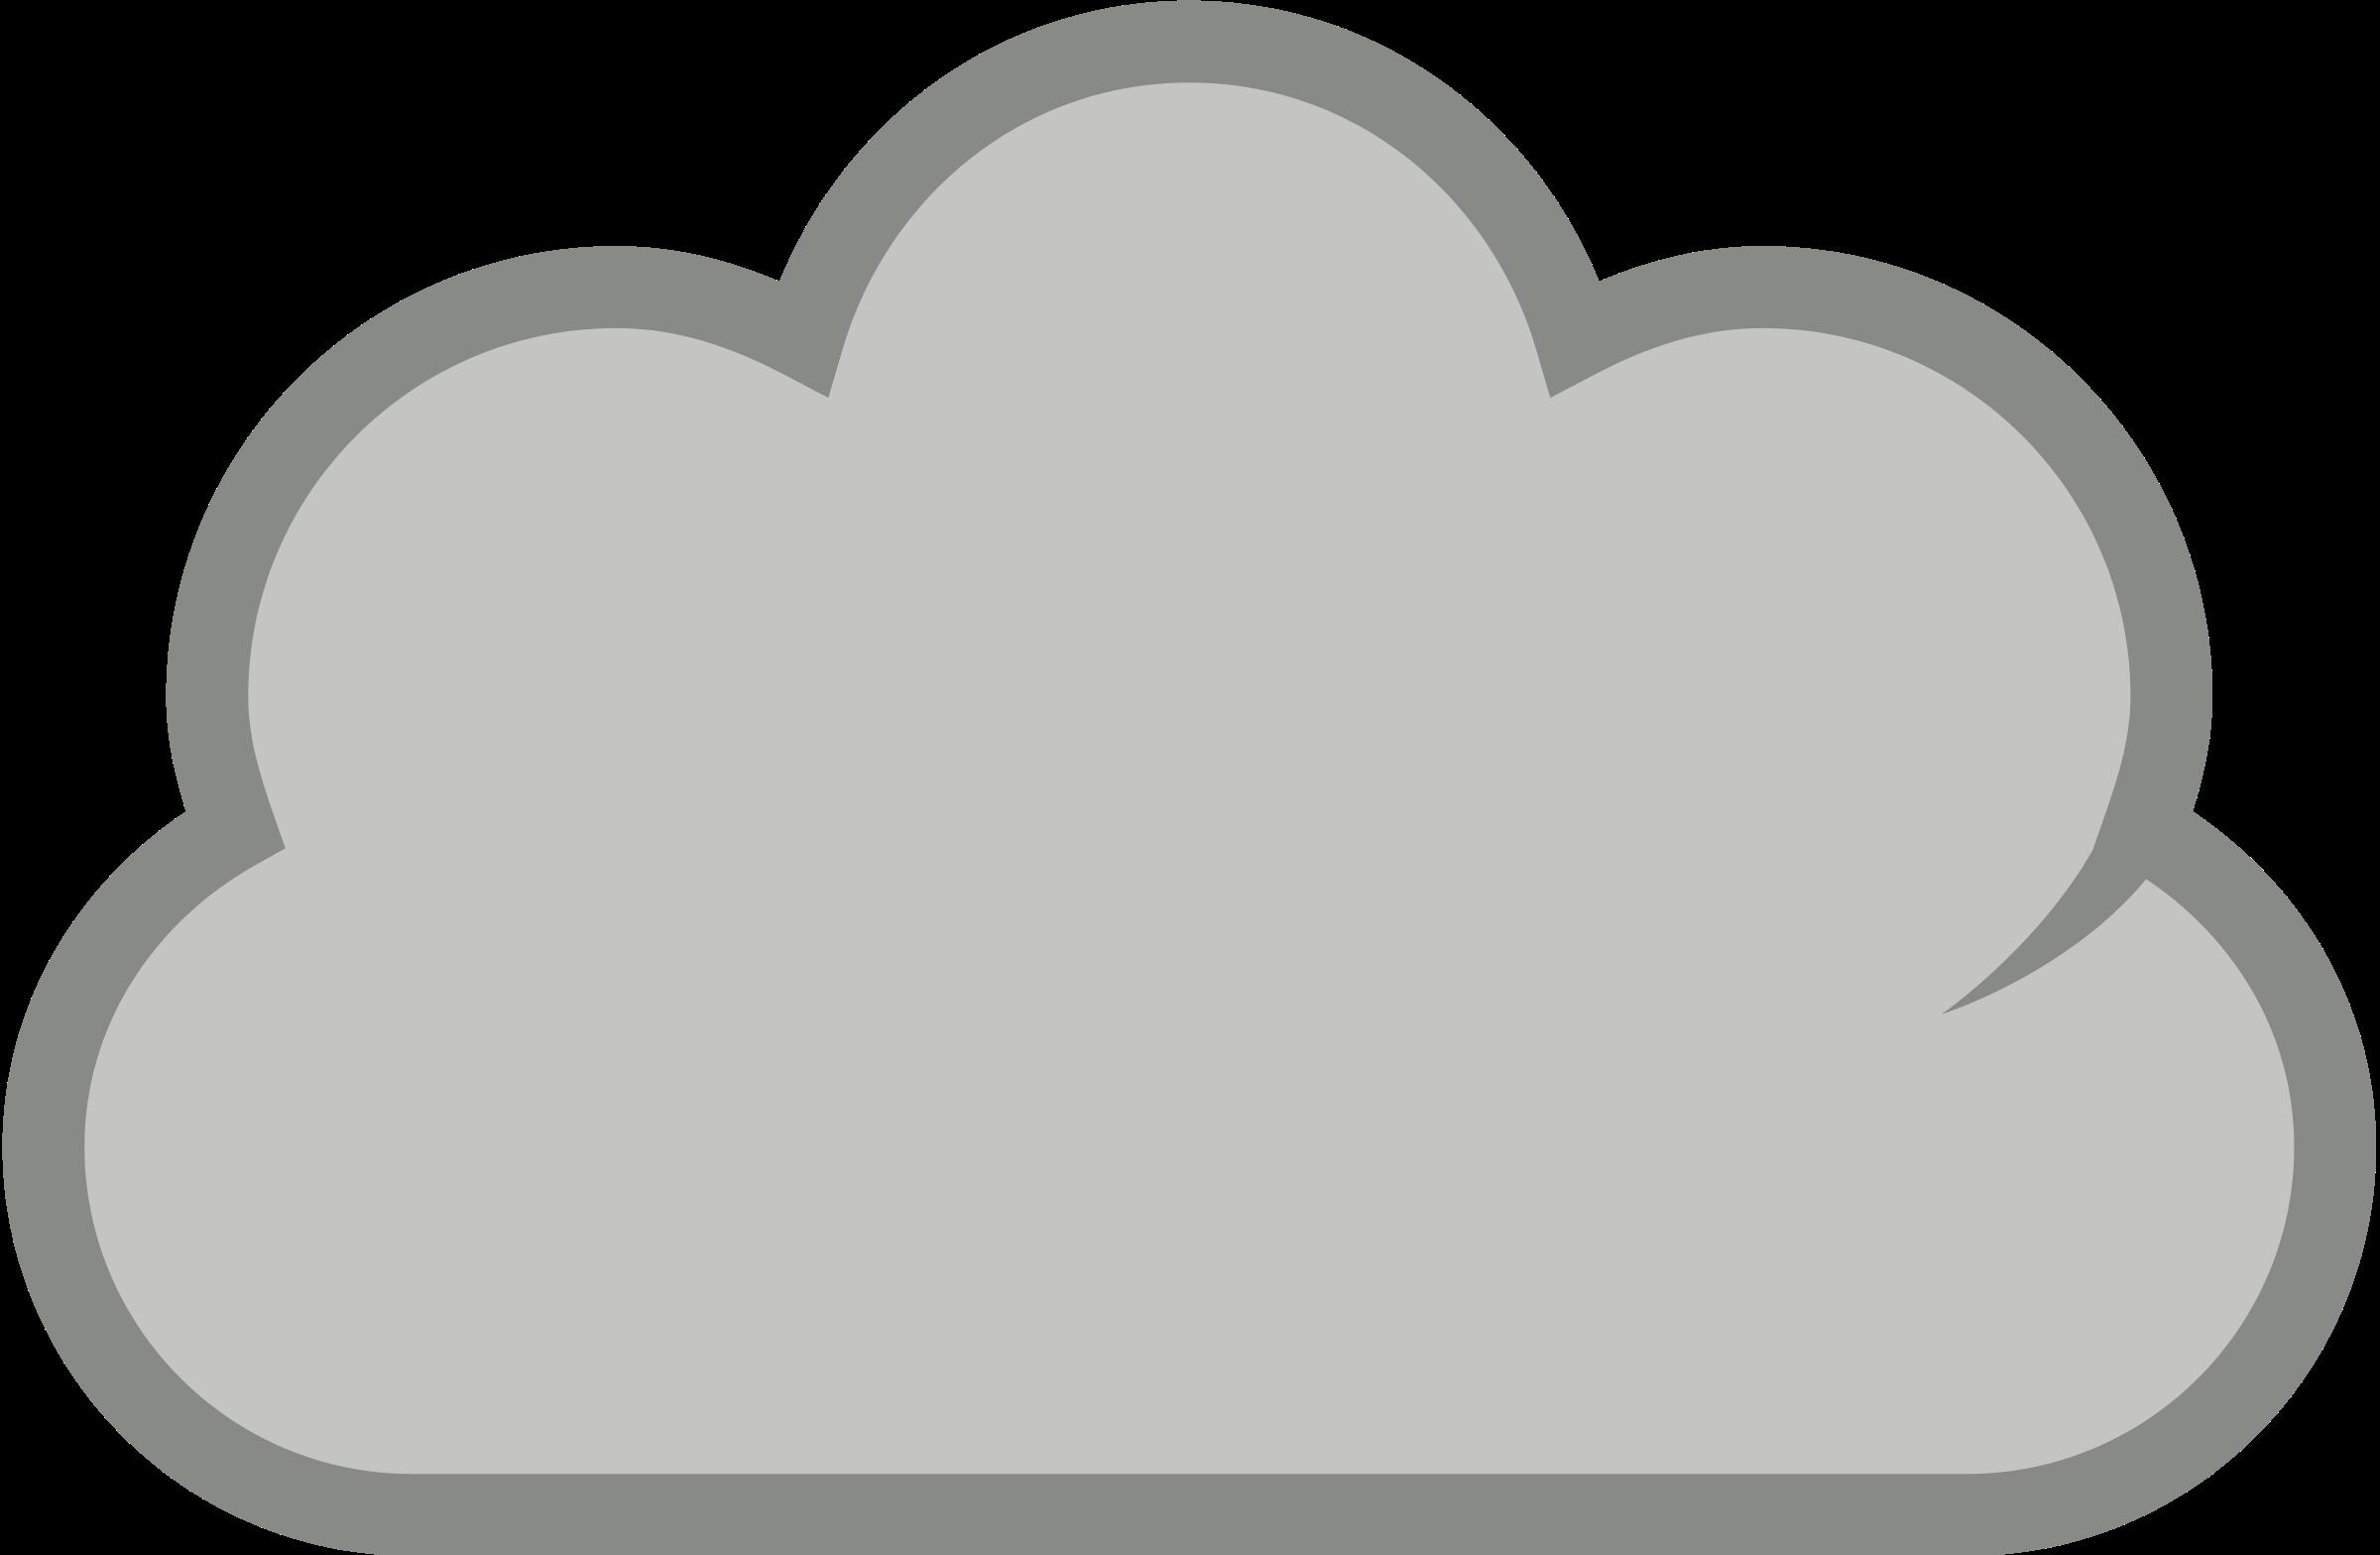 Cloud computing panda free. Sunny clipart symbol